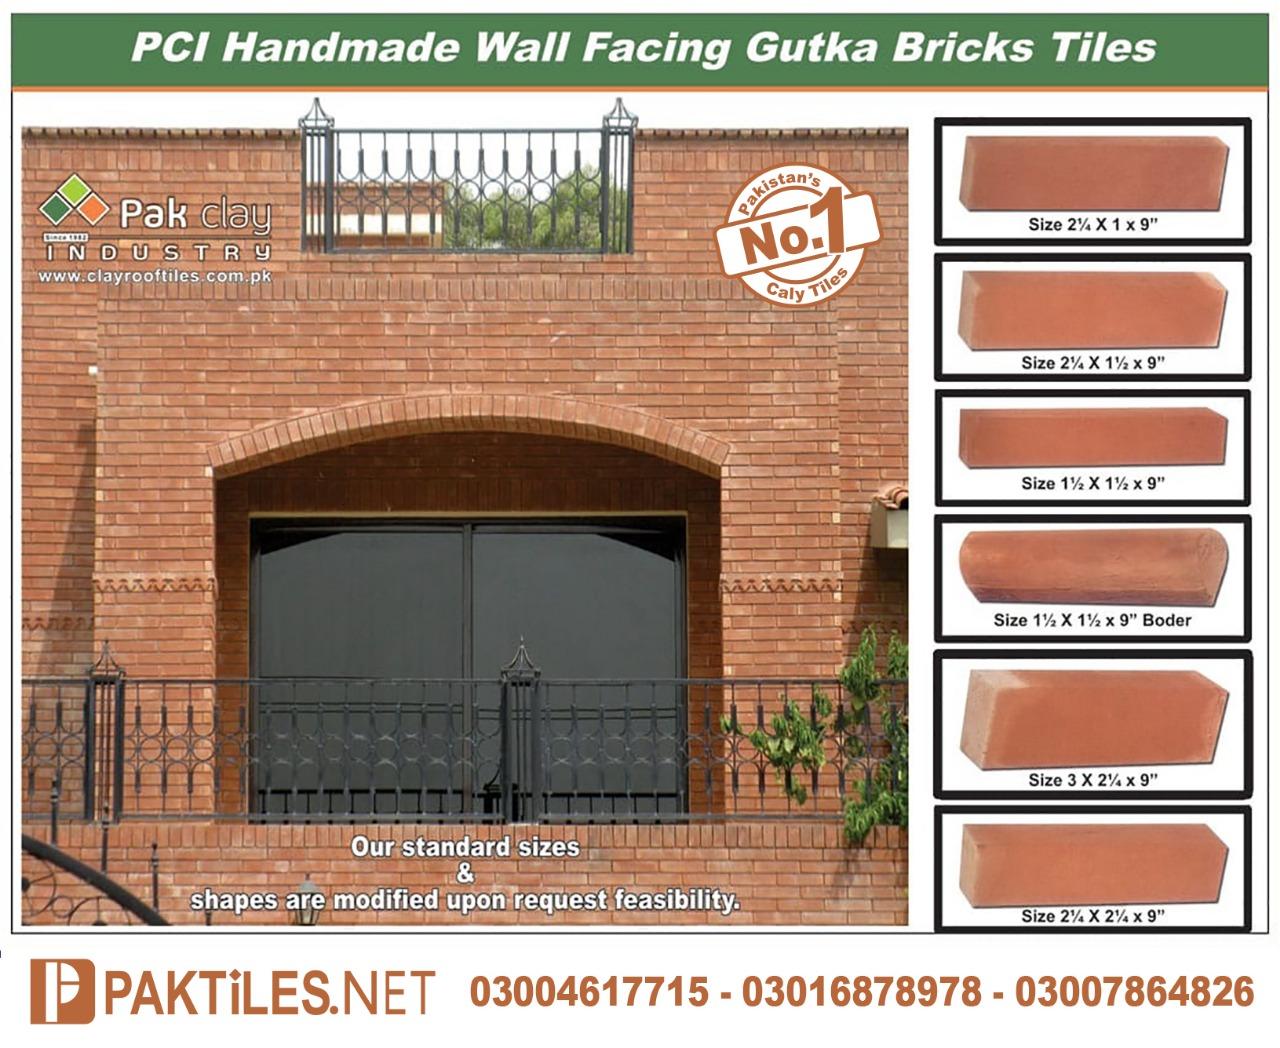 Red Gutka Tile Price in pakistan